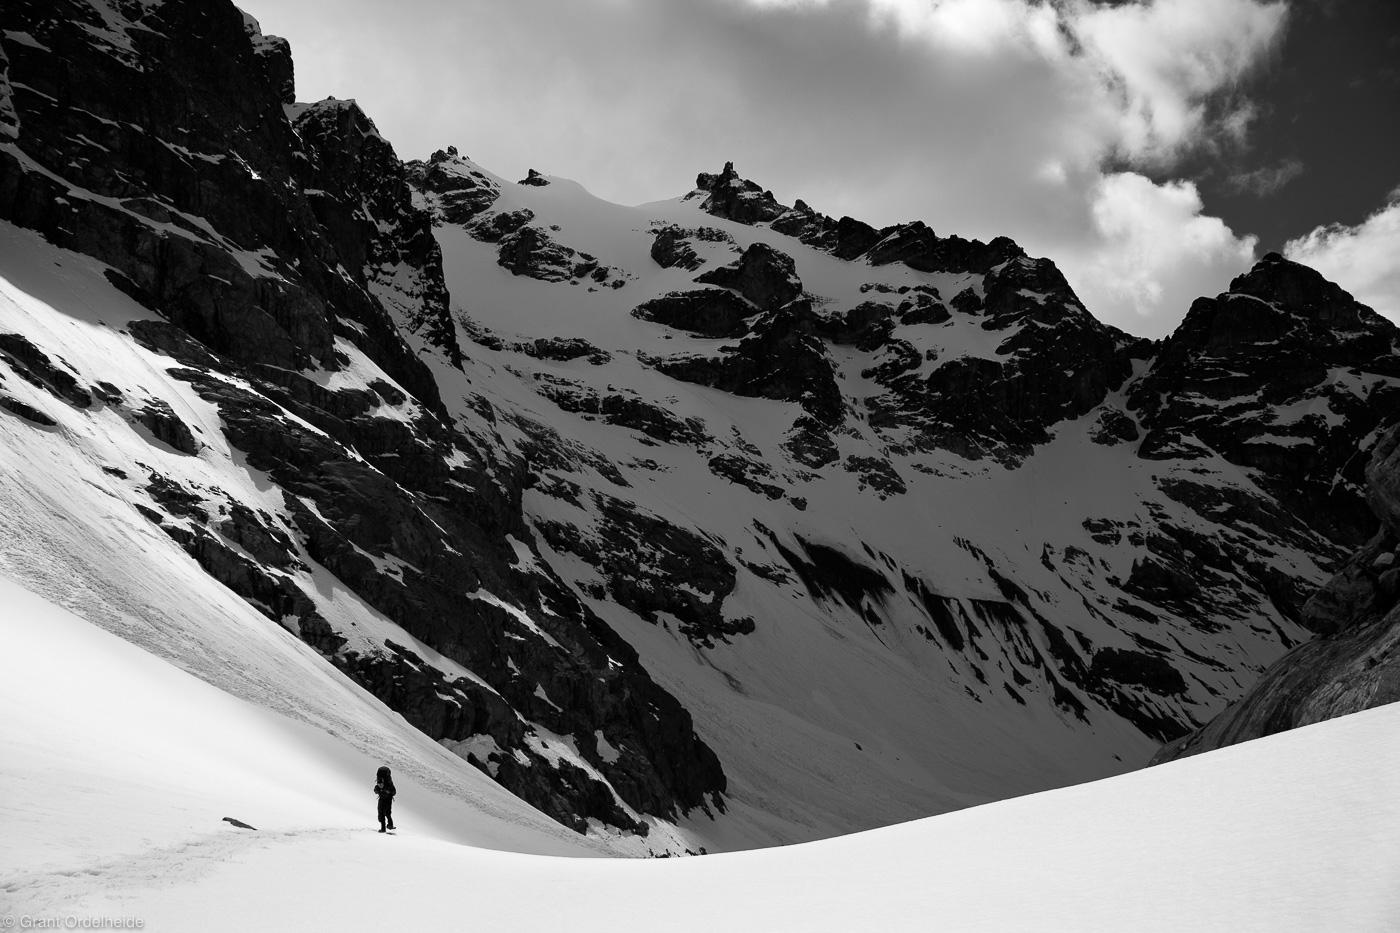 glacier, glacial, trekking, castillo, cerro, national, reserve, coyhaique, chile, Cerro Peñon, photo